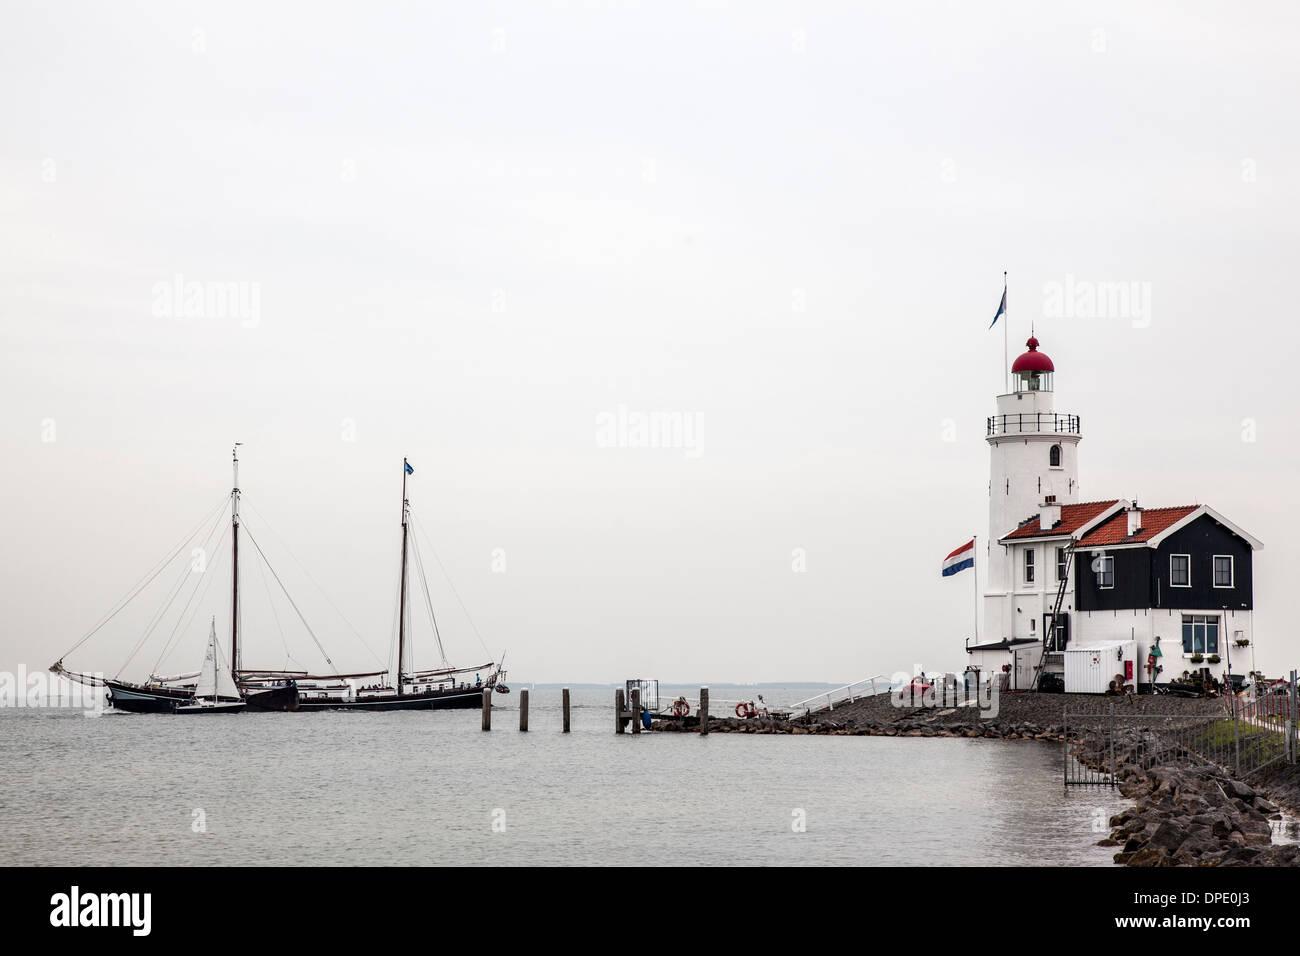 Lighthouse and sailing boats, Marken, Netherlands - Stock Image